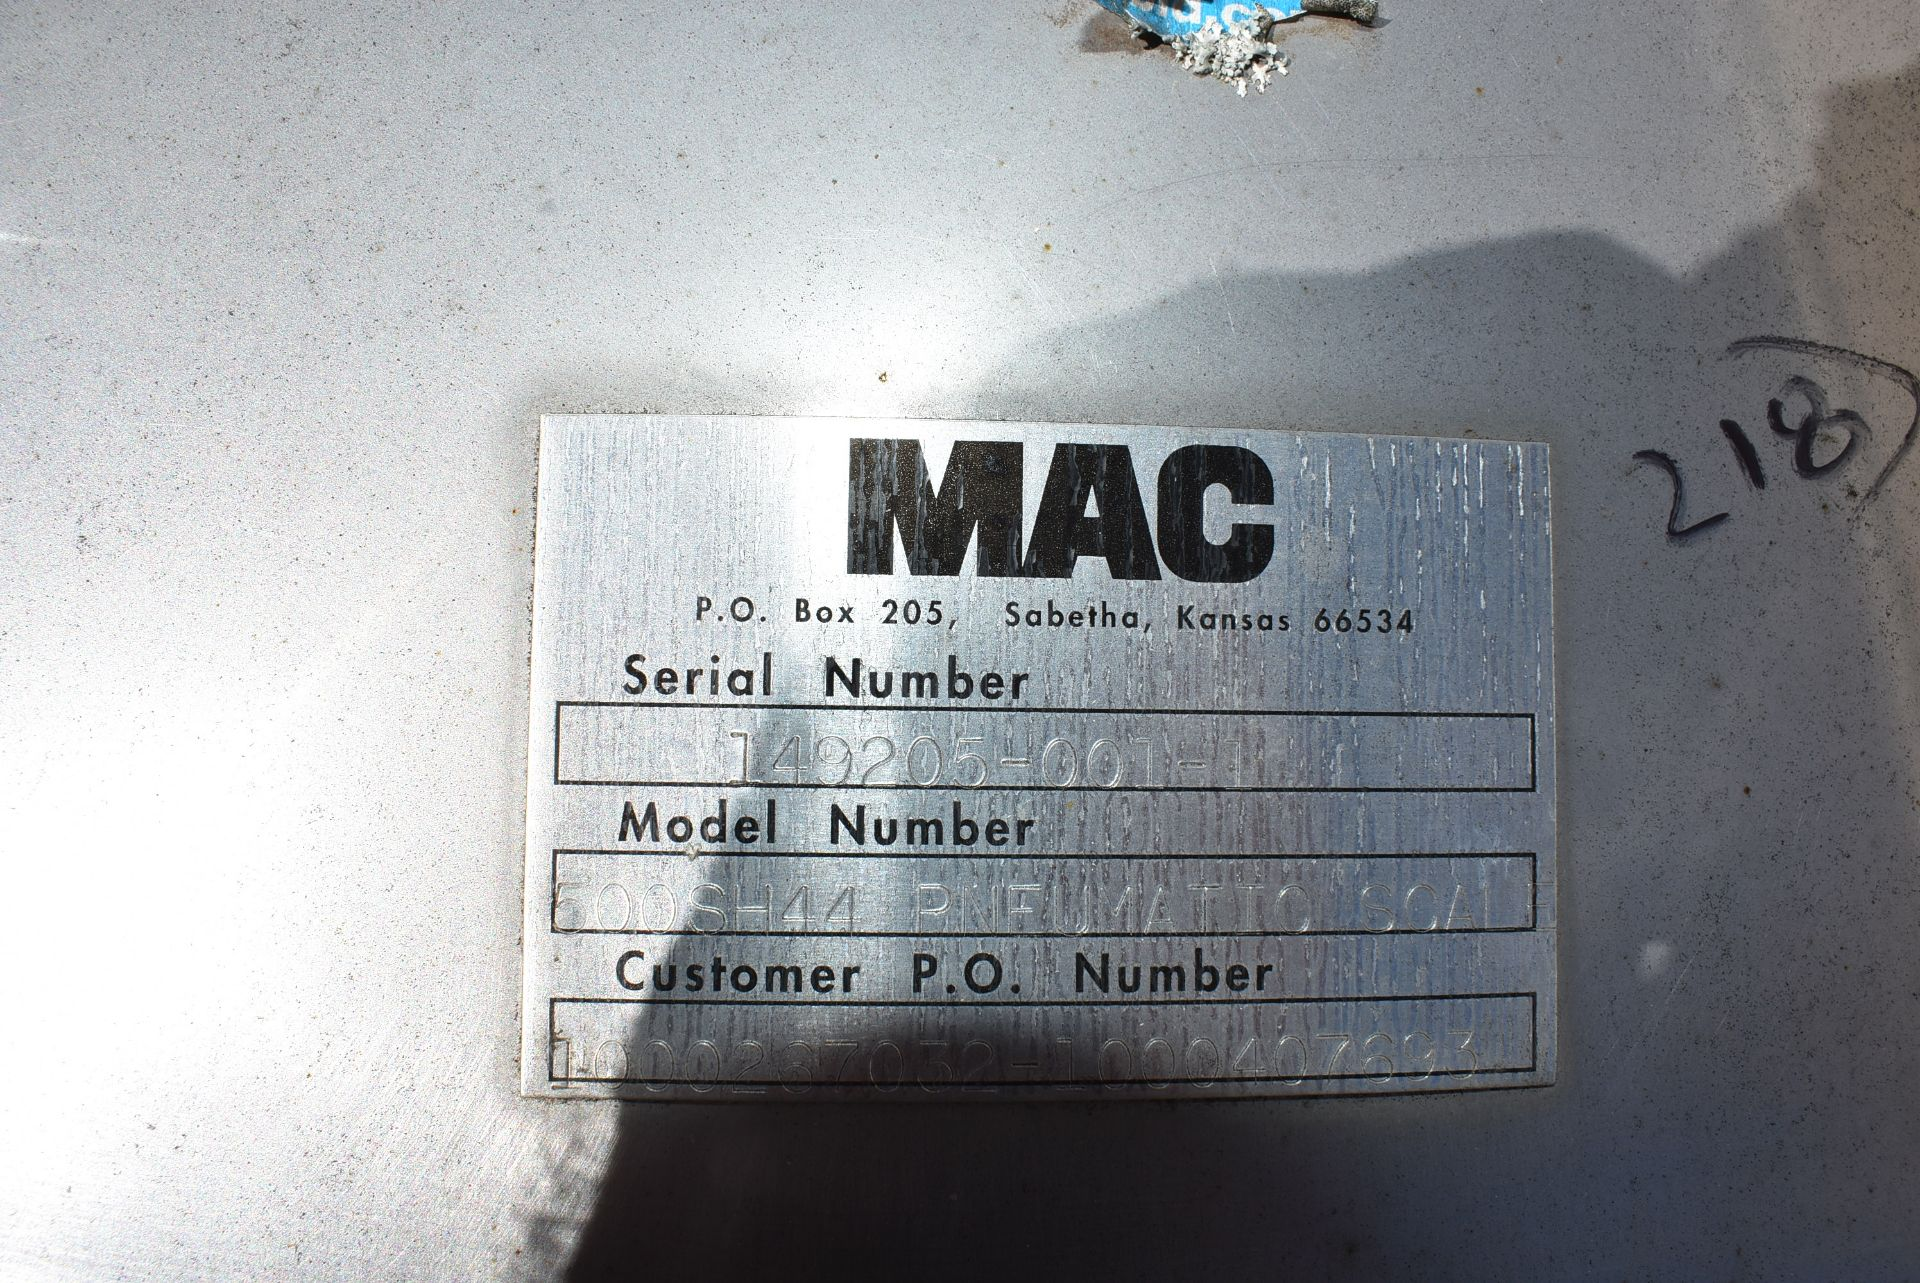 MAC Model #500SH44 Pneumatic Scale - Image 2 of 2